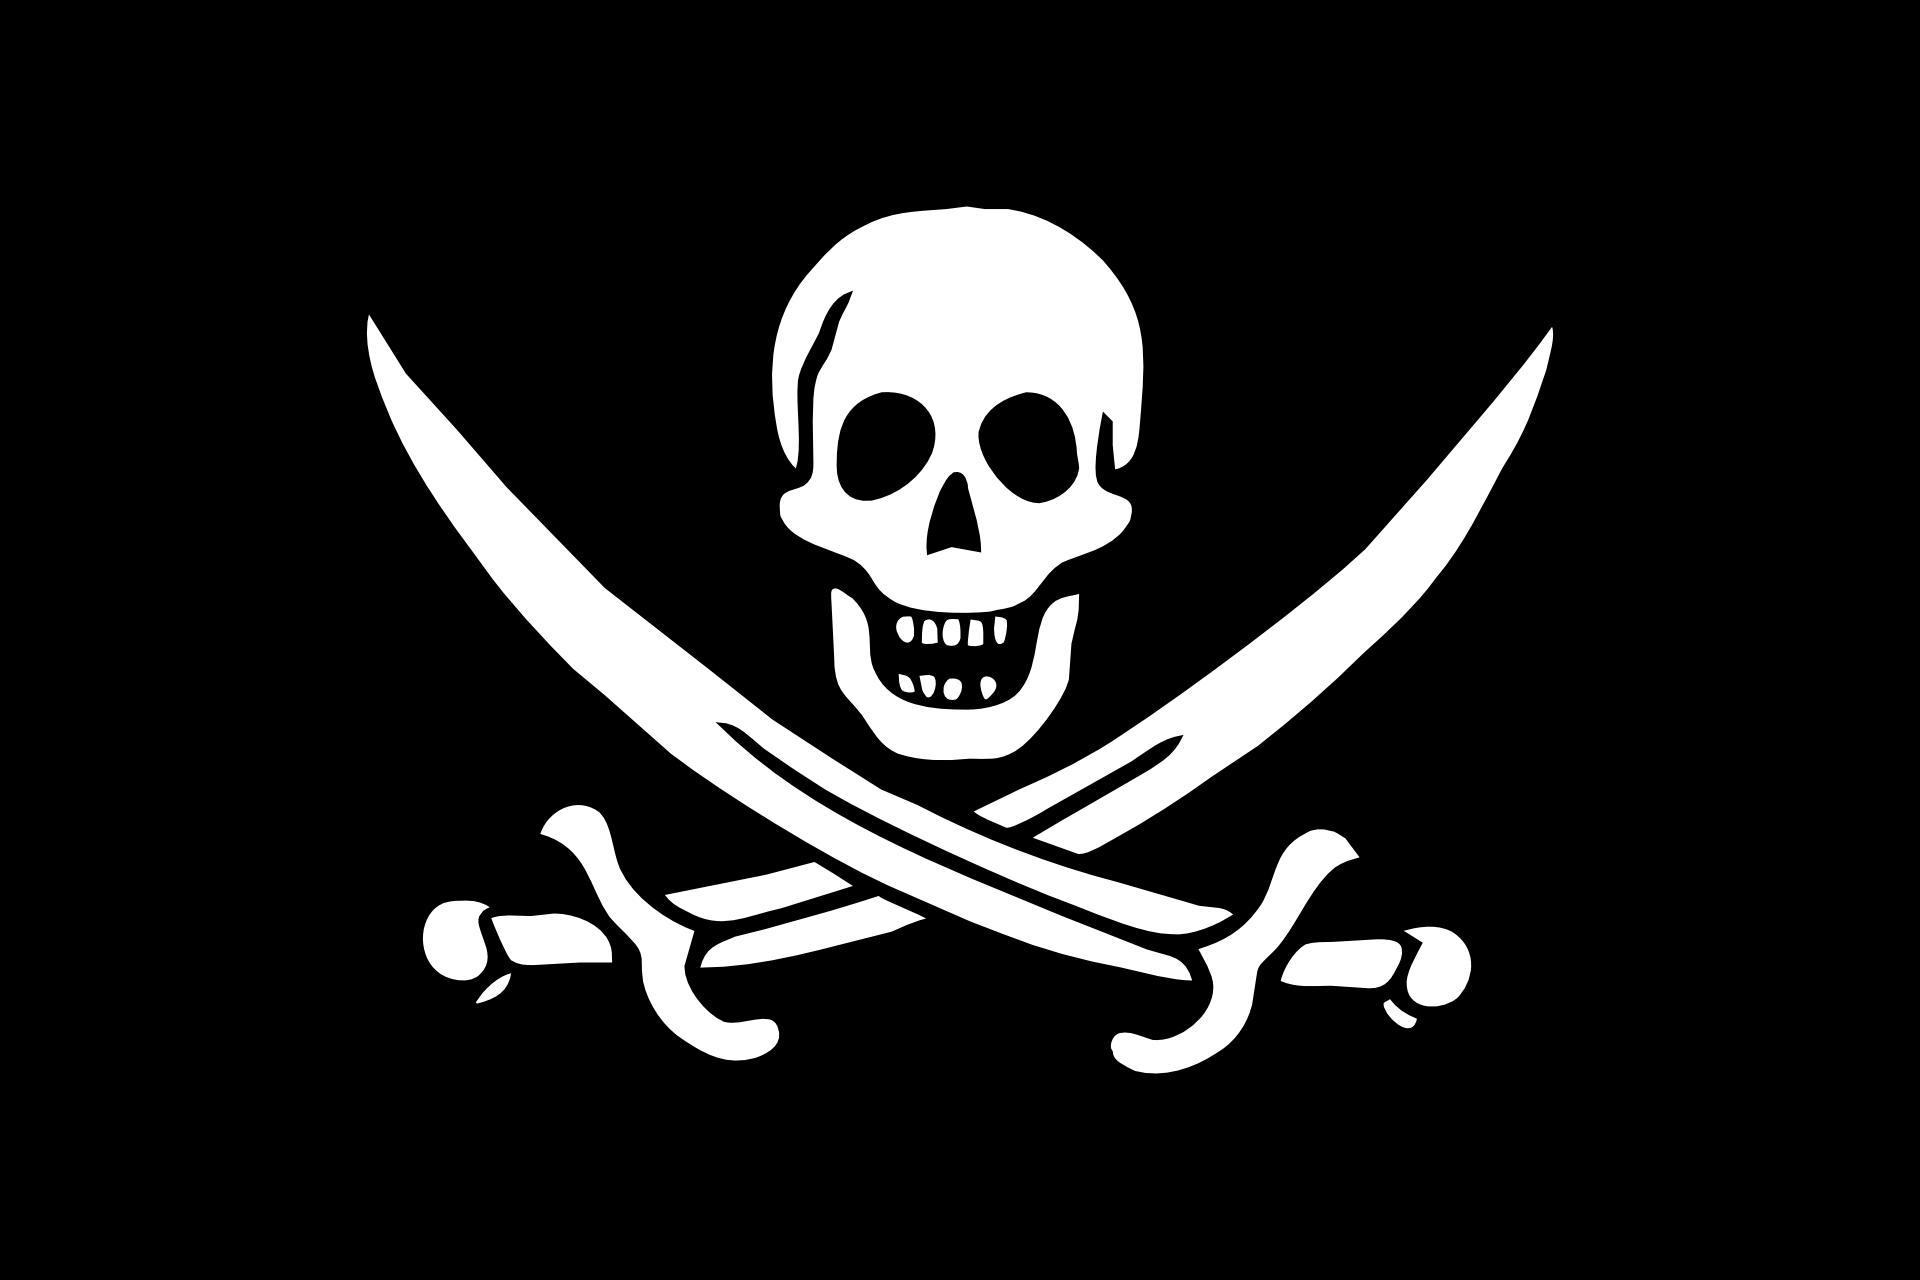 pirate flag skull and swords screensaver animated live desktop